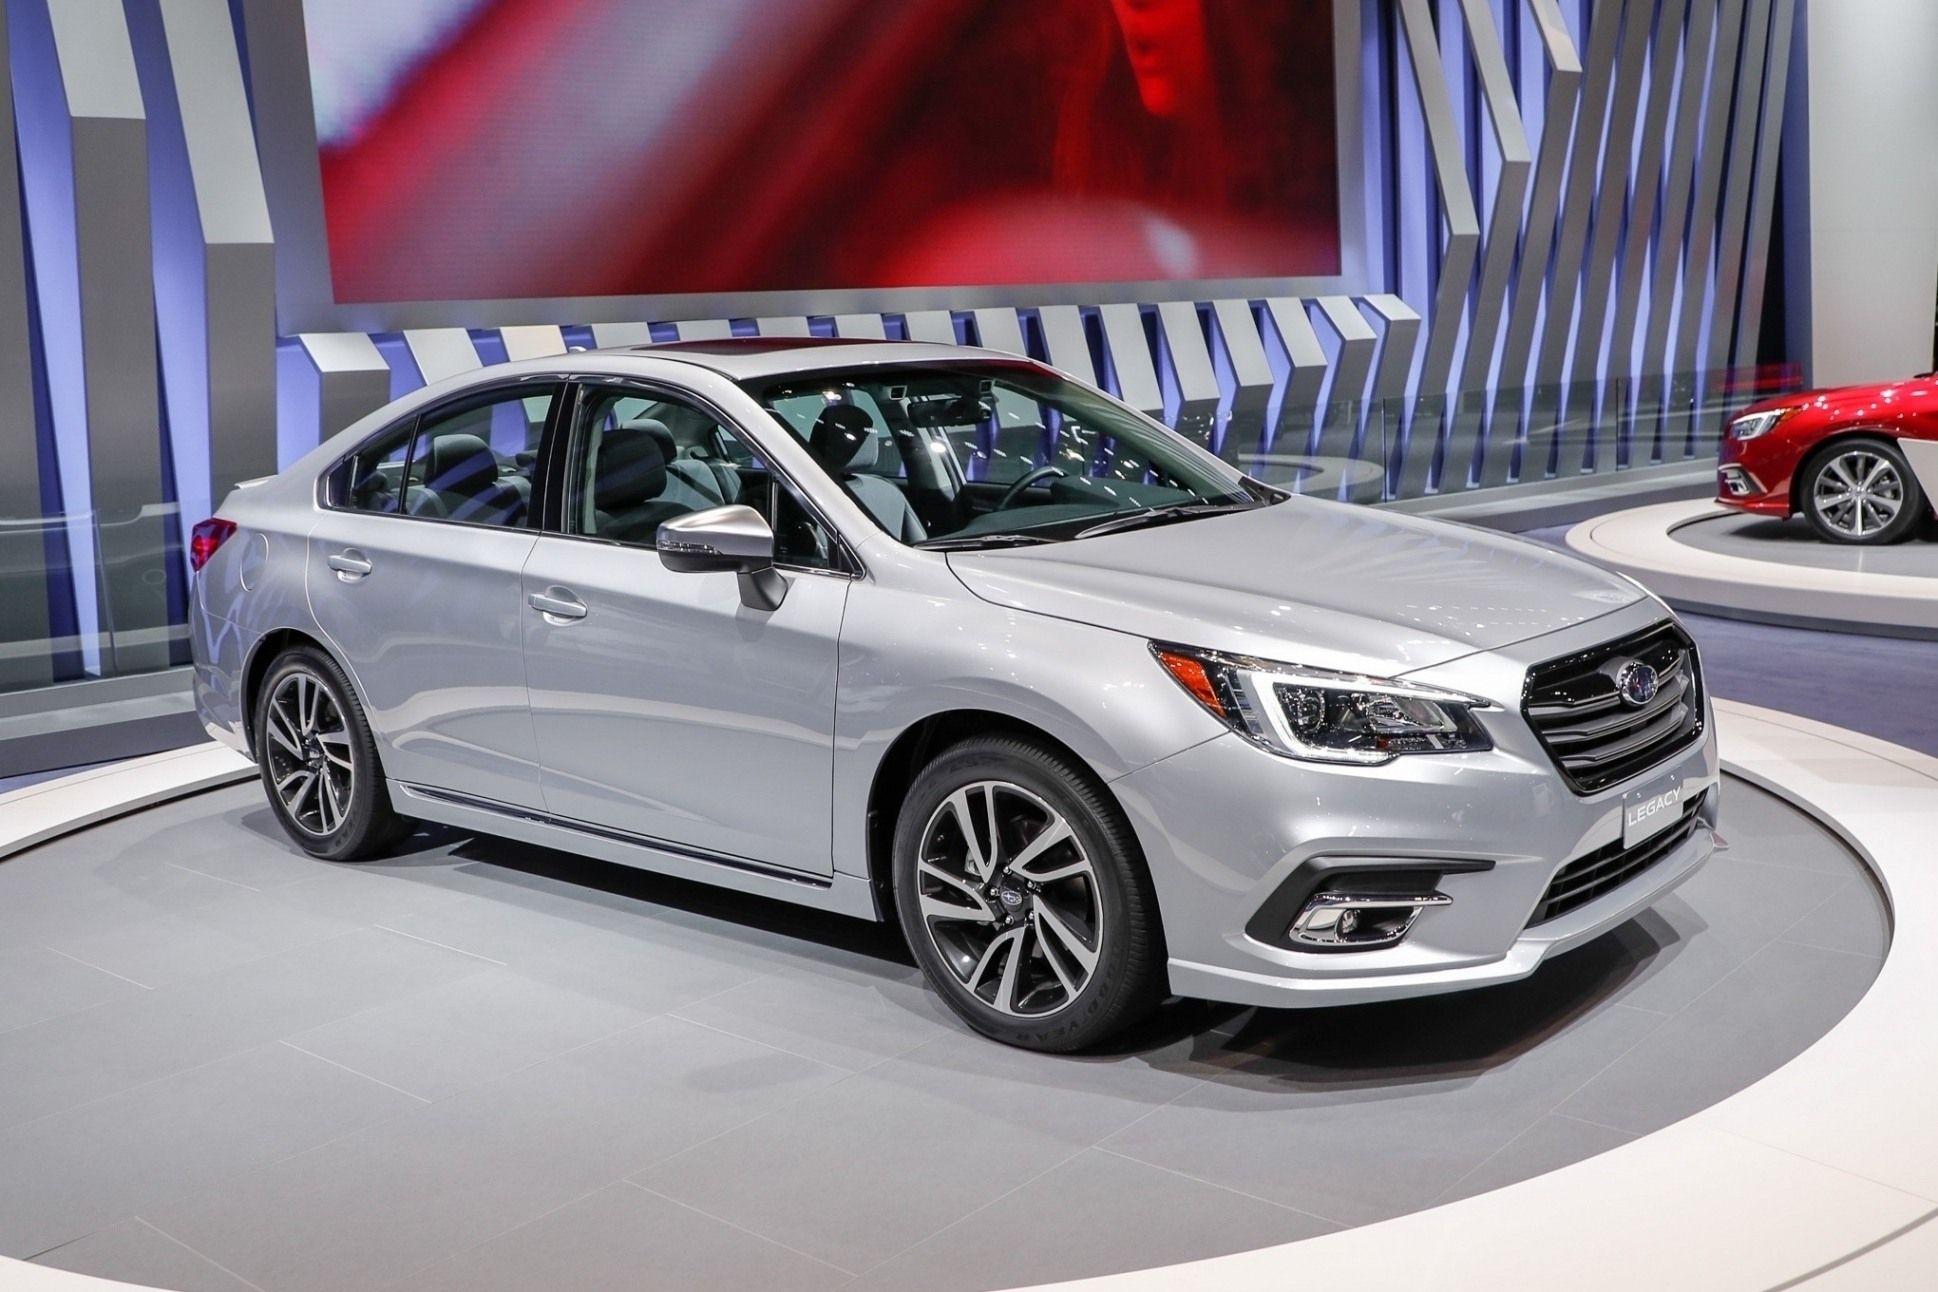 2019 Subaru Legacy Brochure Review And Specs Car Review 2018